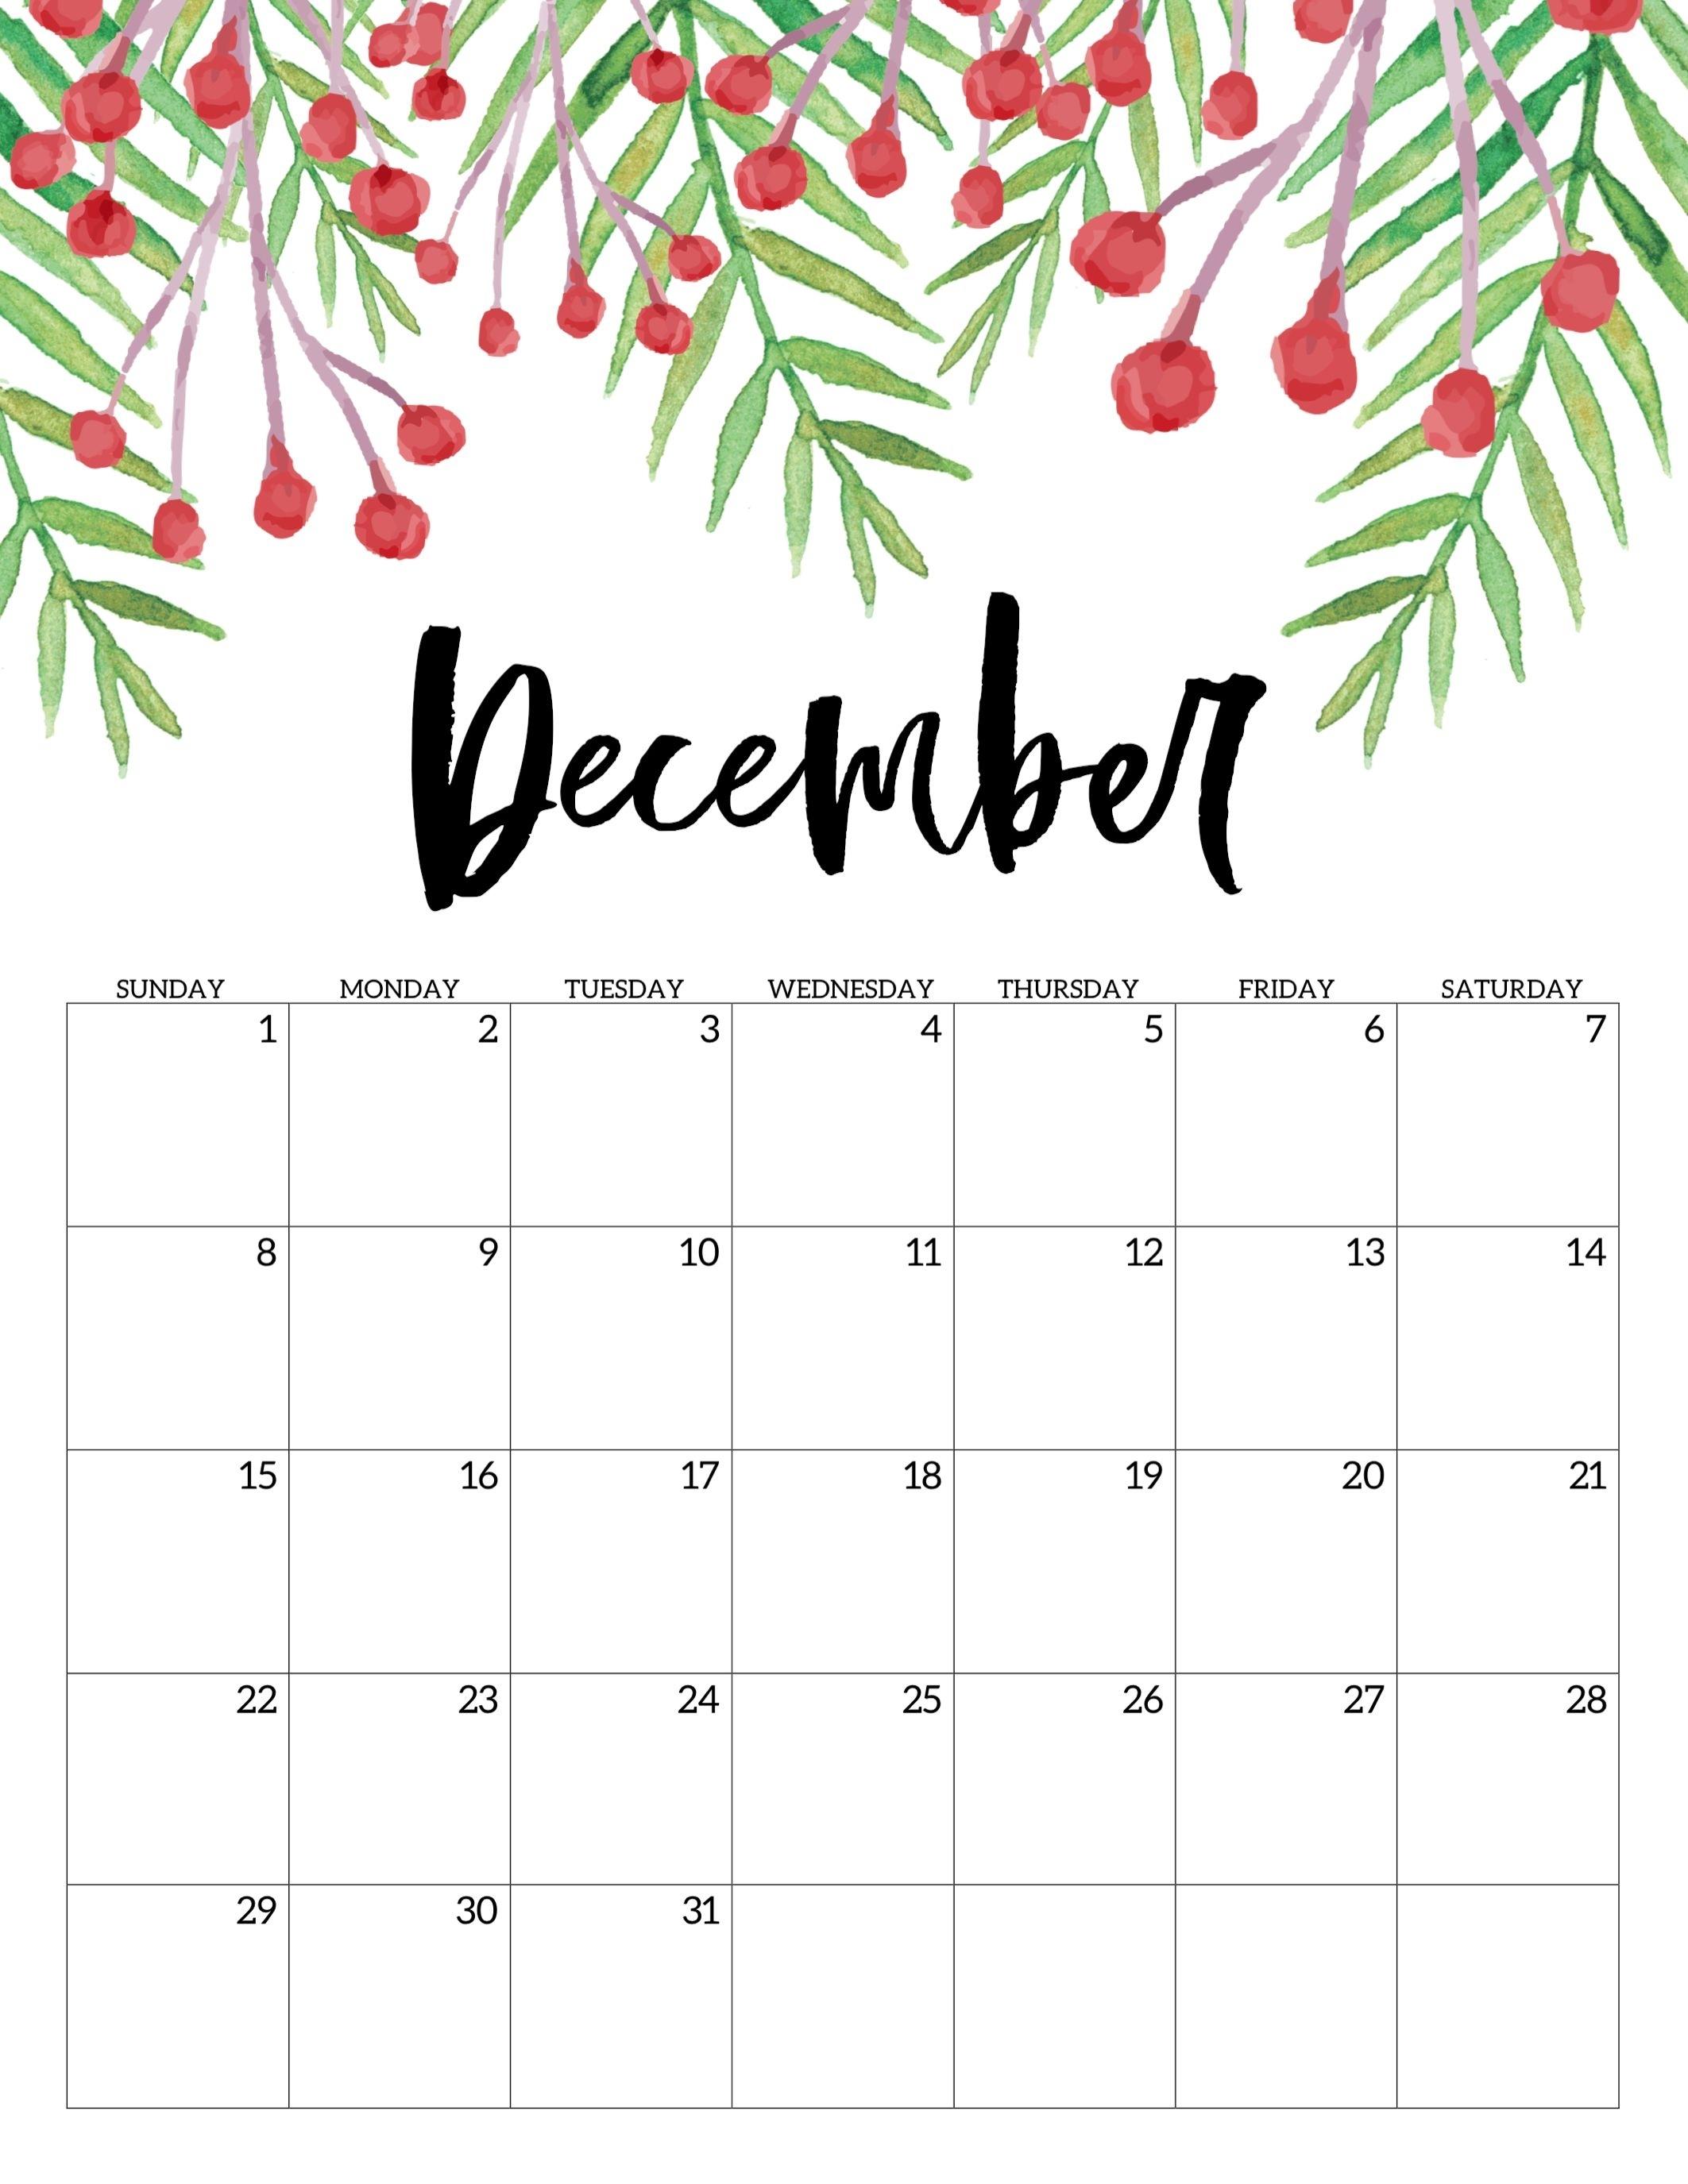 Free Printable Calendar 2019 - Floral | Print Calendar, Free